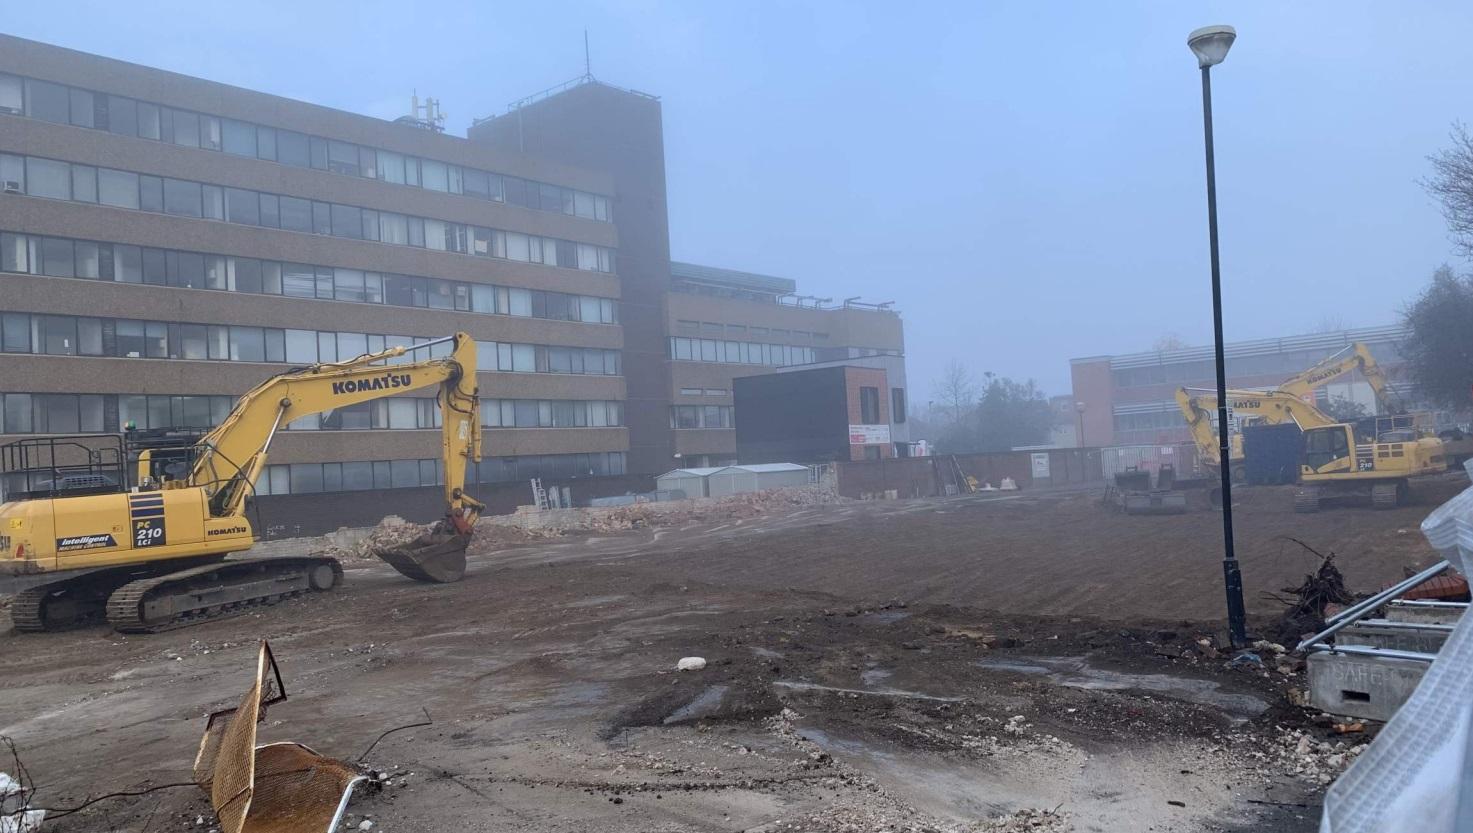 Eltham town centre council housing: Greenwich Council submit plans